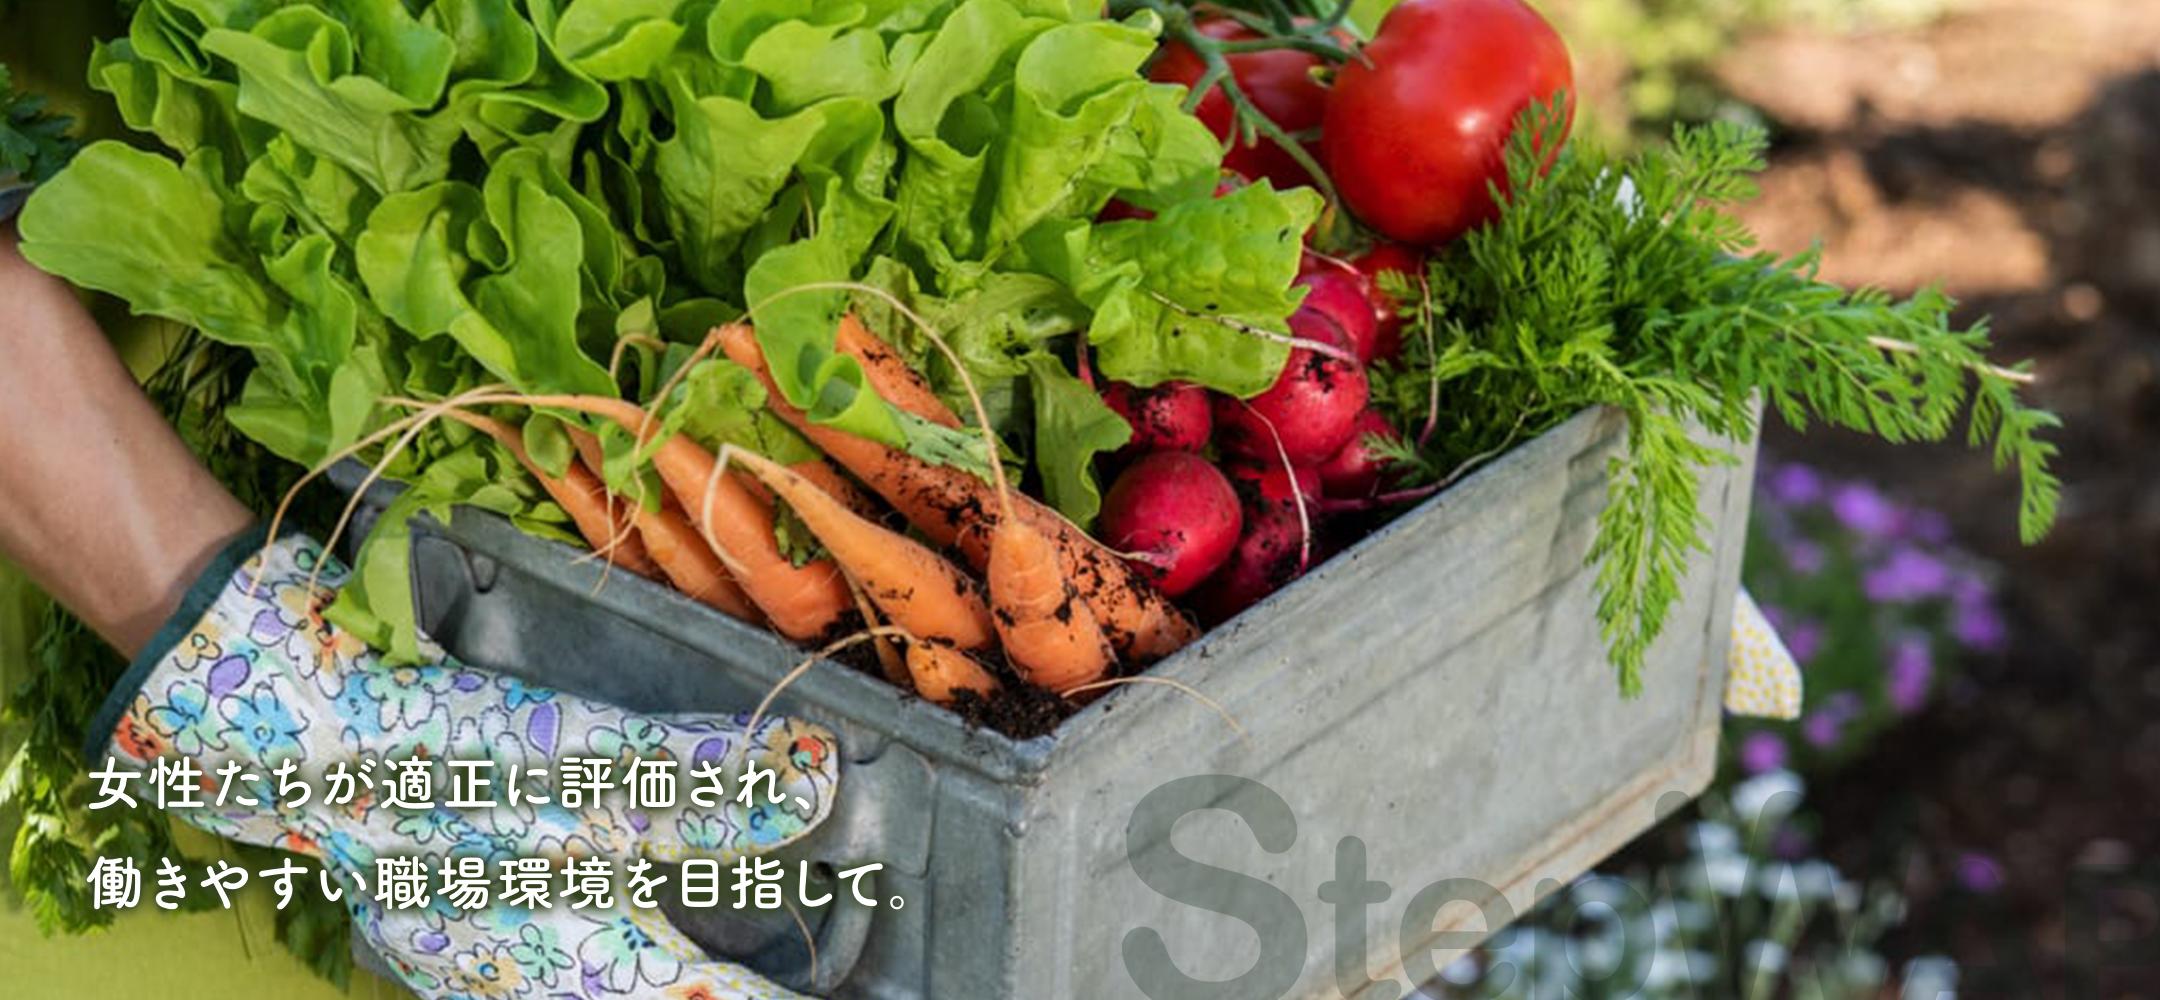 STEP WAP - 農業の働き方改革-男女共同参画による経営発展-